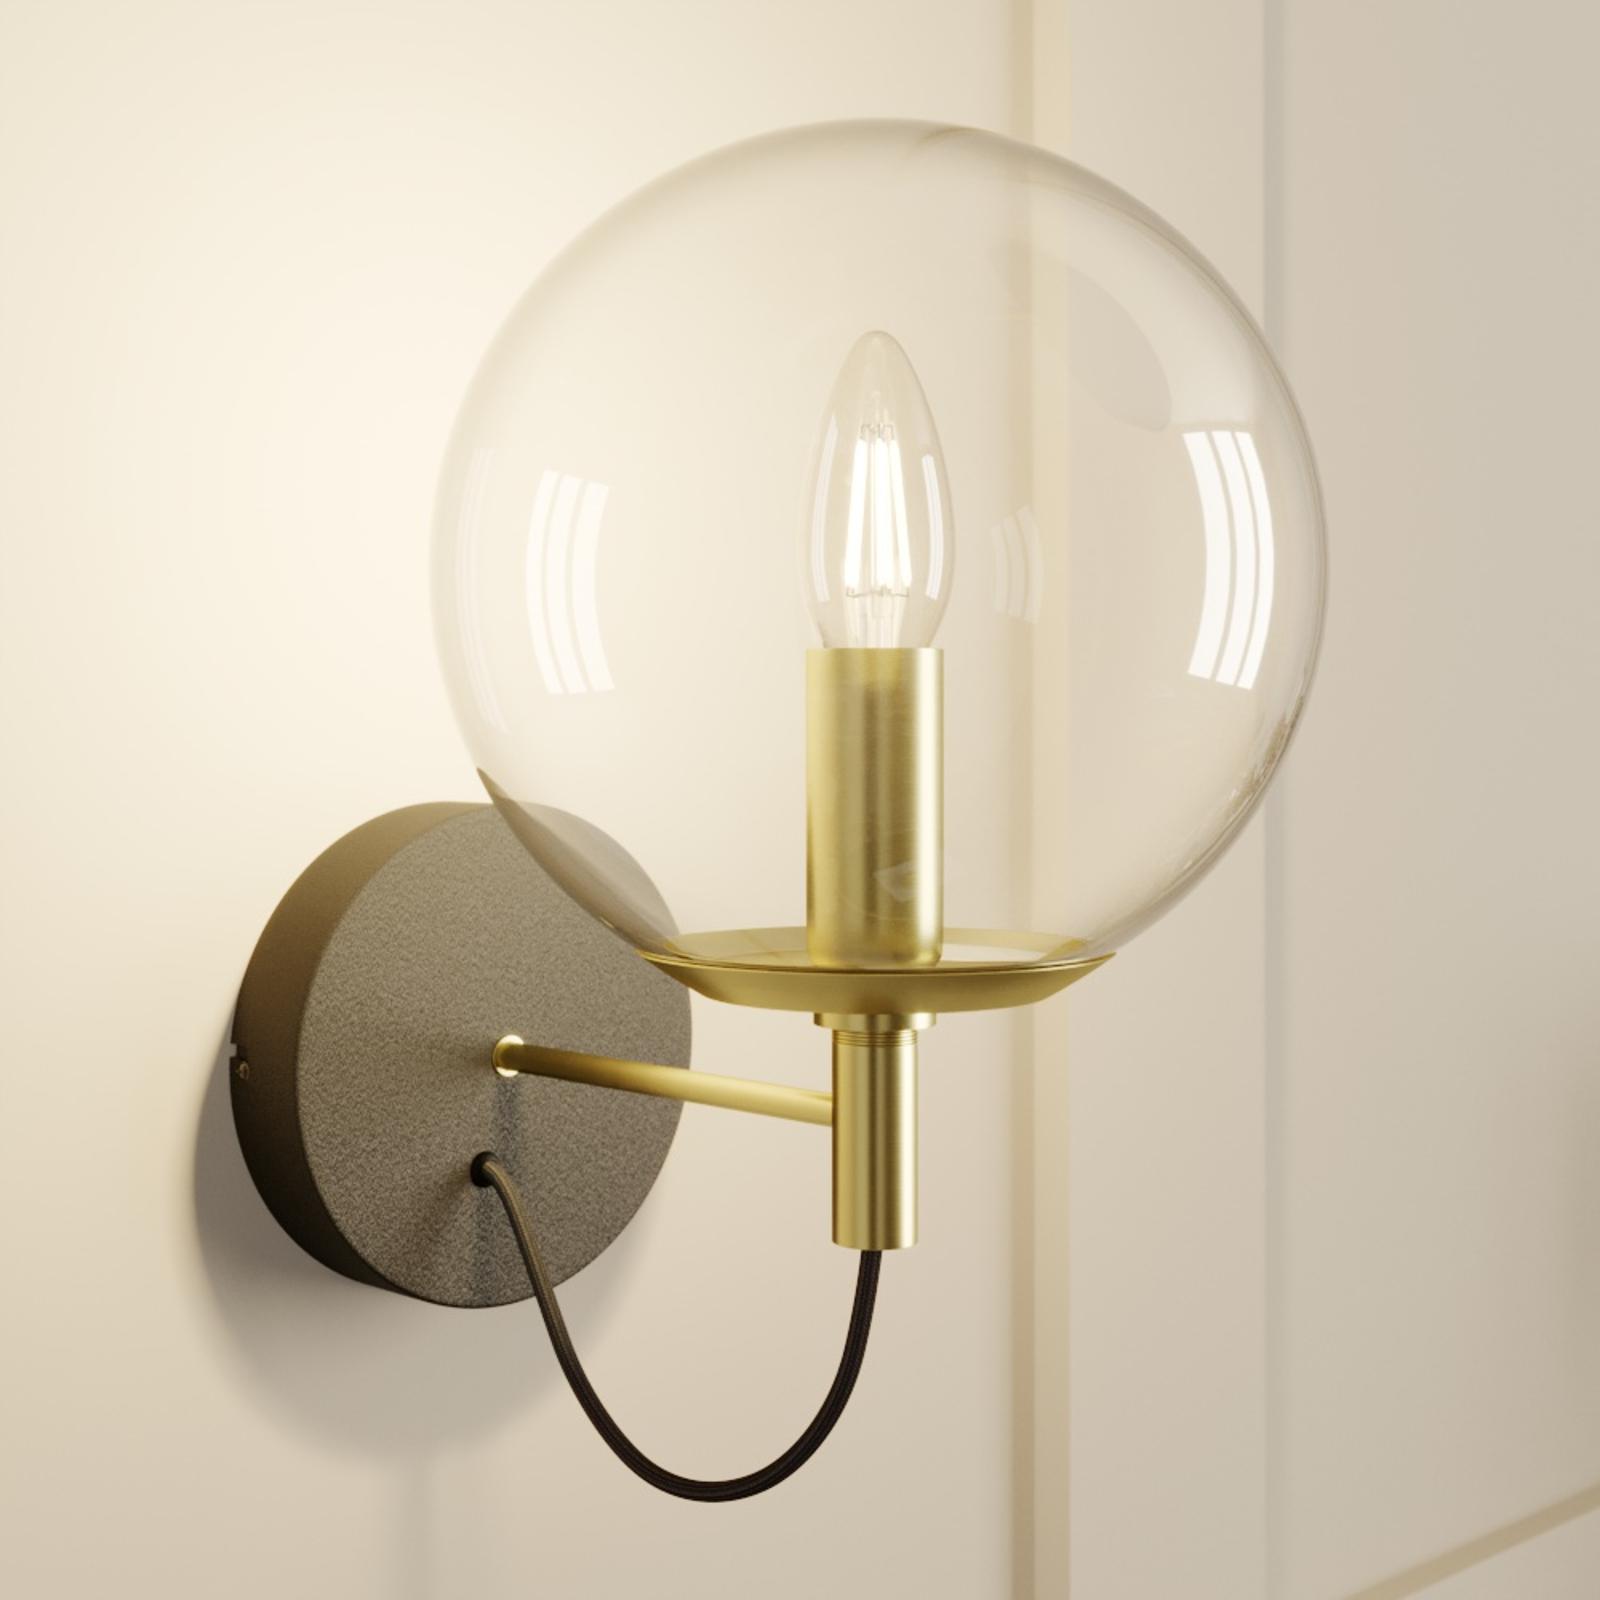 Lucande Sotiana applique a sfera di vetro, ottone